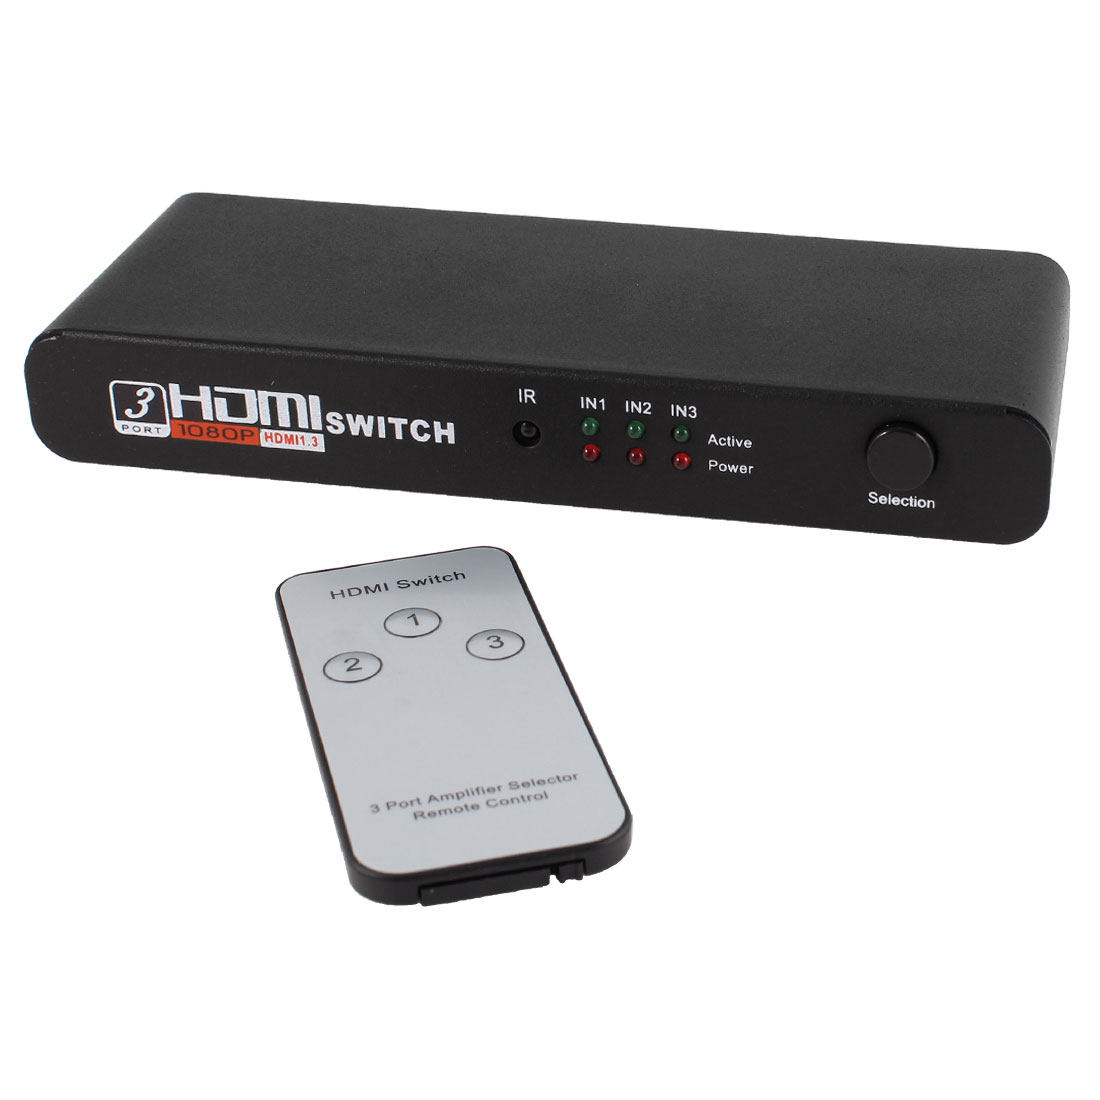 US Plug AC100-240V 3 Port 1080P Video HDMI Switch Splitter for DVD STB PC + IR Remote